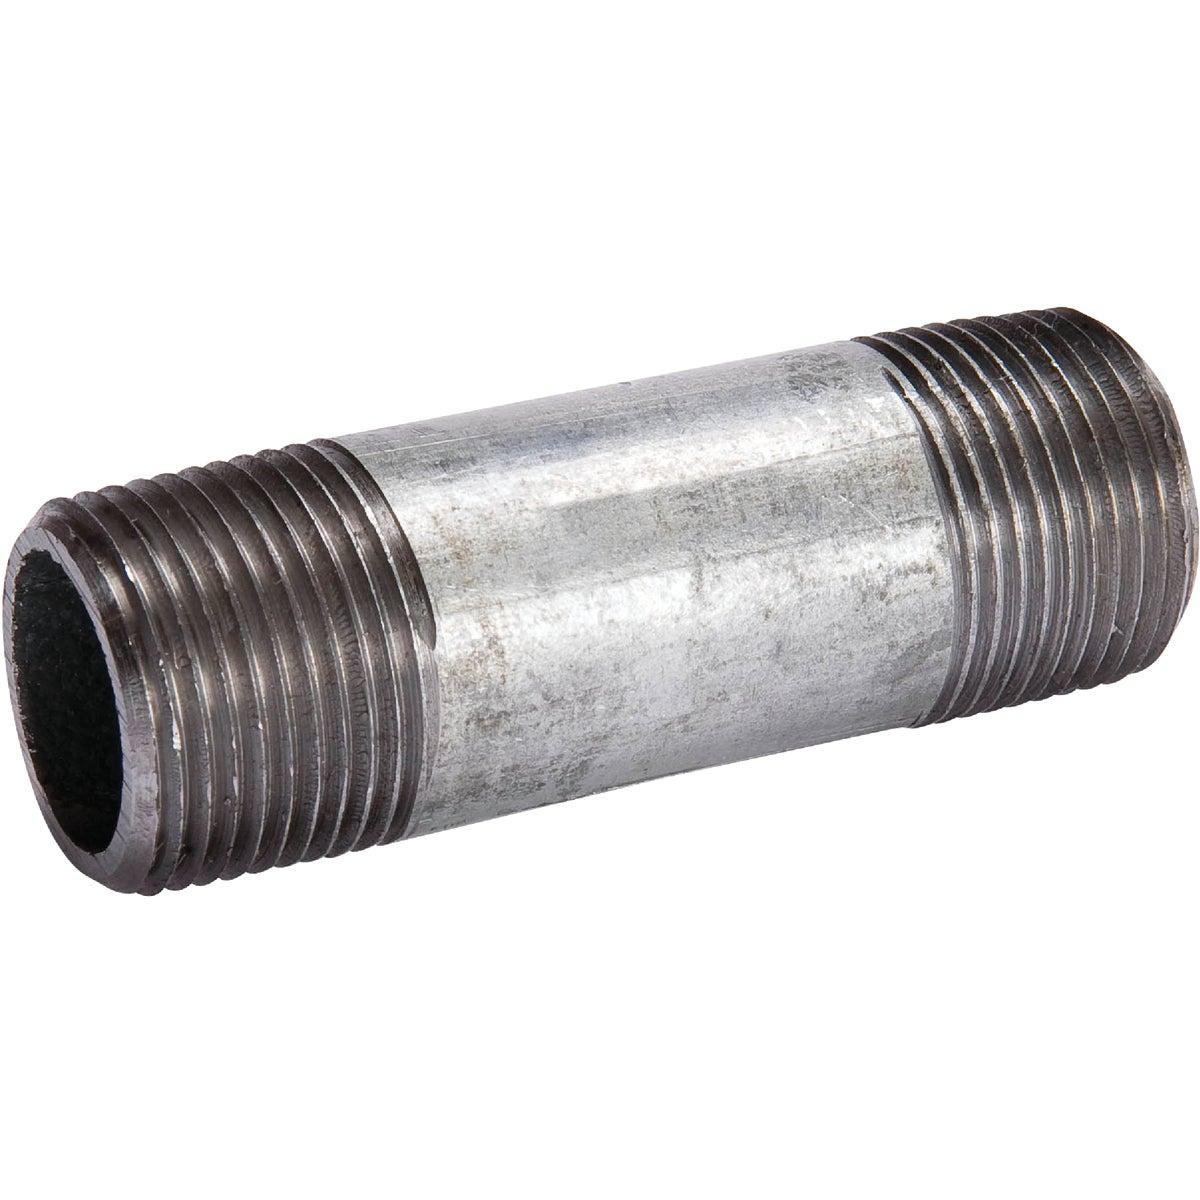 Southland Pipe Nipple 1/4X4 GALV NIPPLE 10206